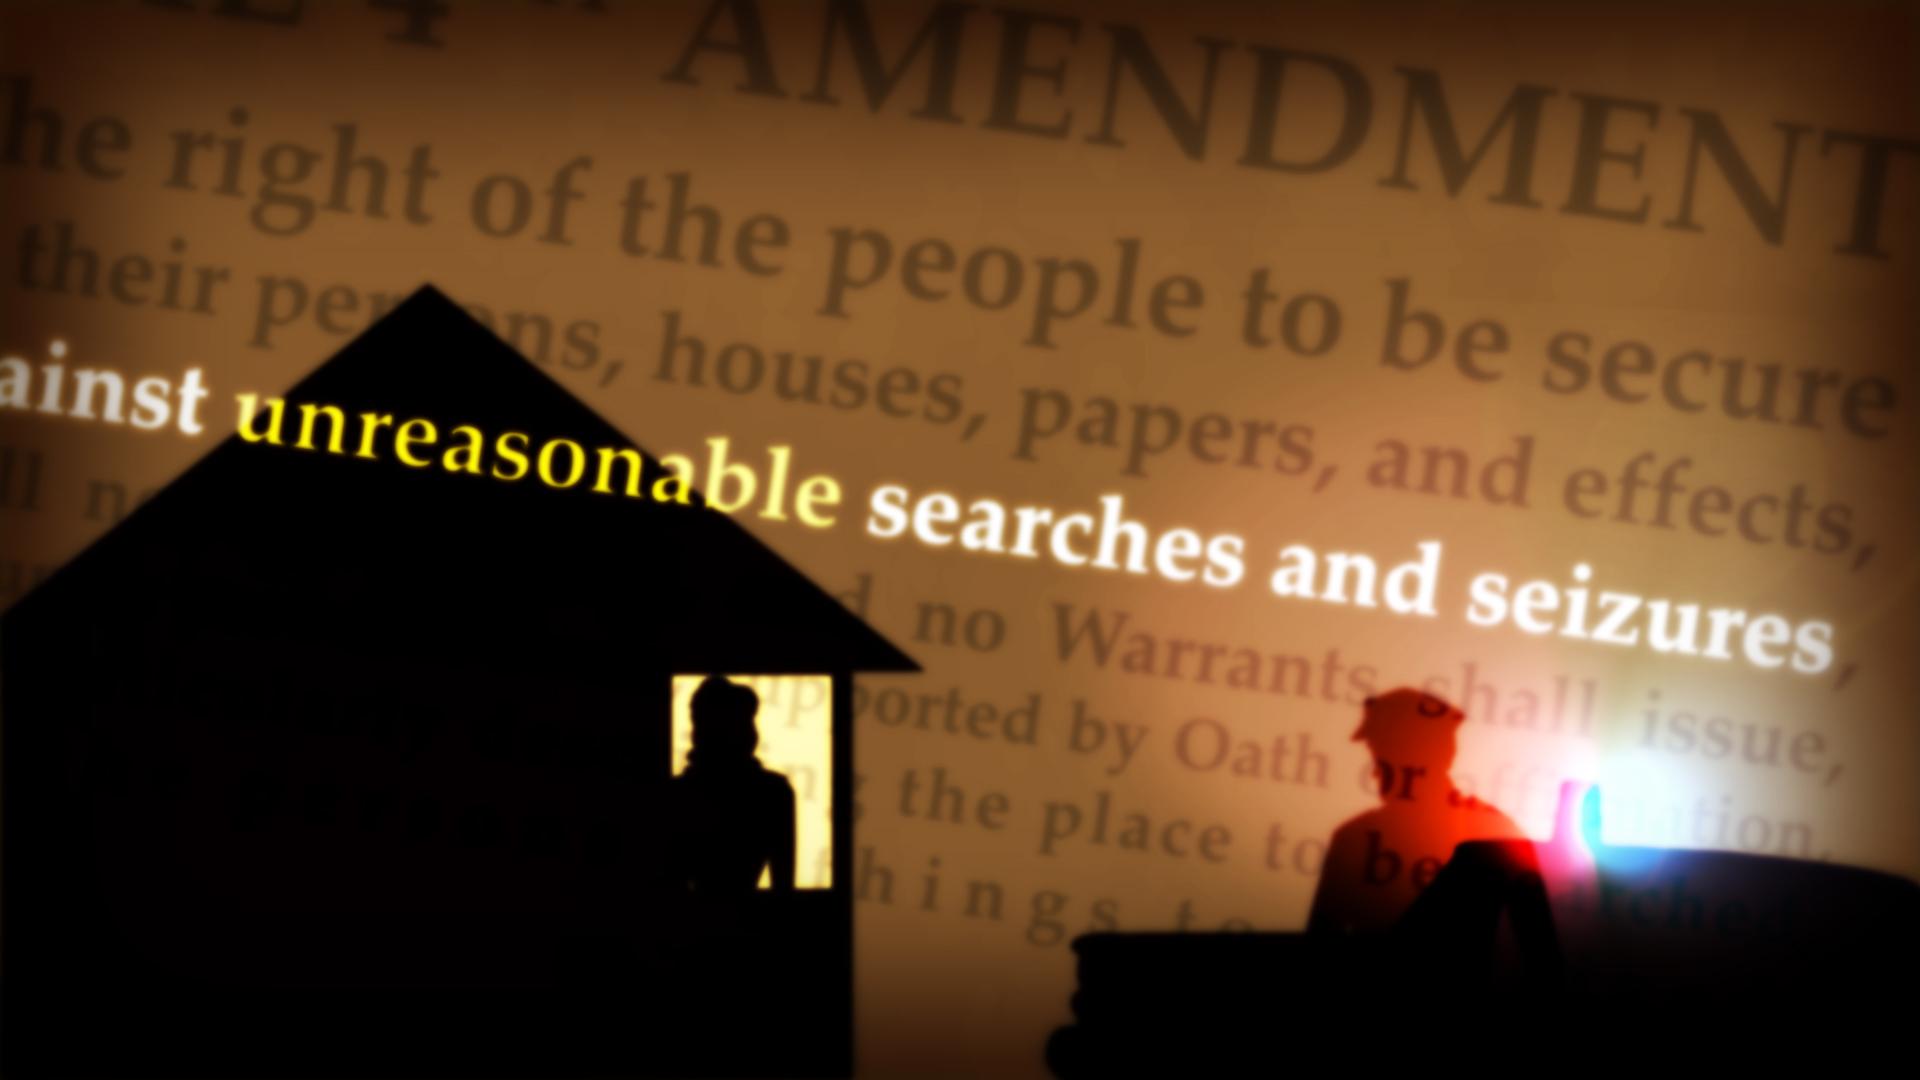 Mapp 4th amendment1